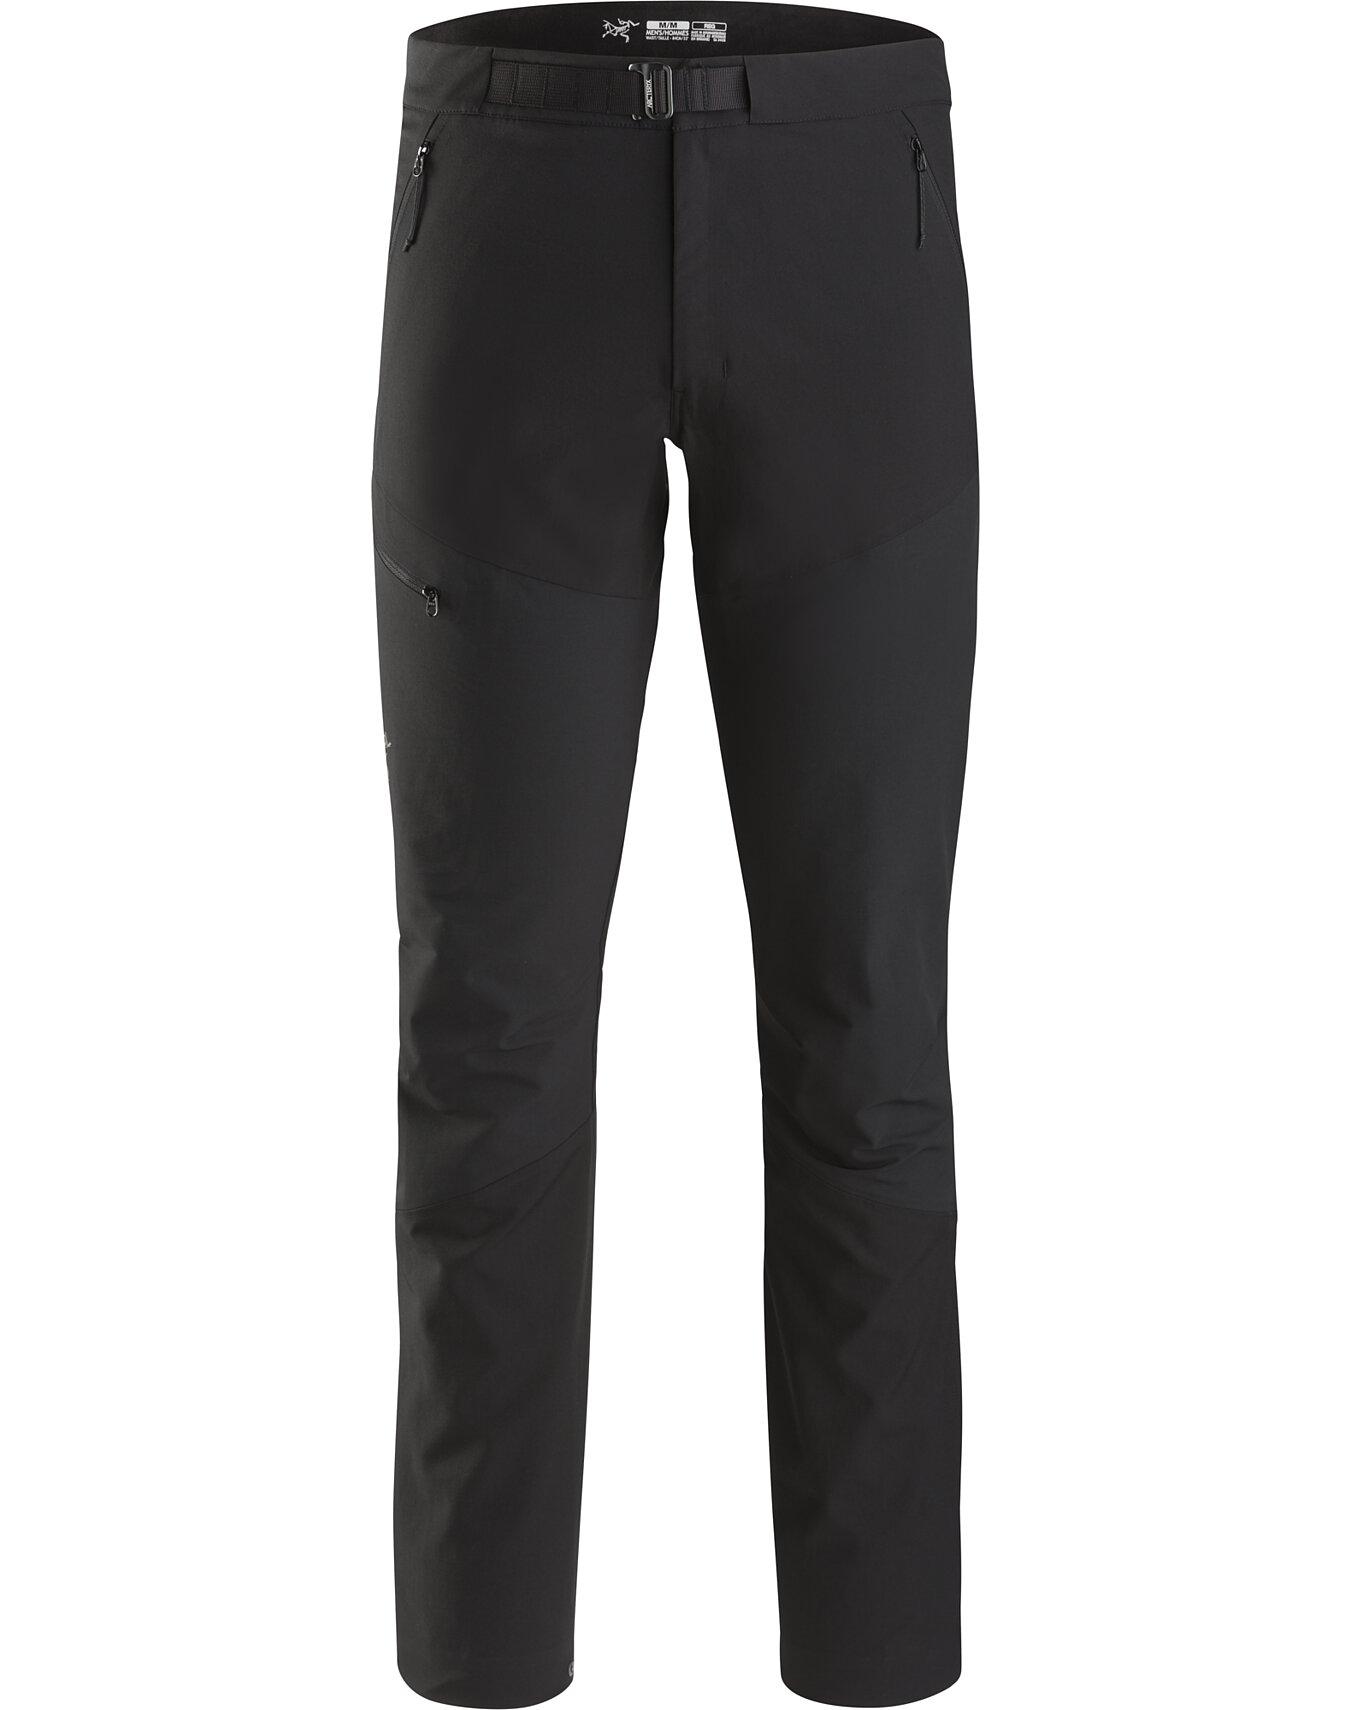 Sigma FL Pant Men's